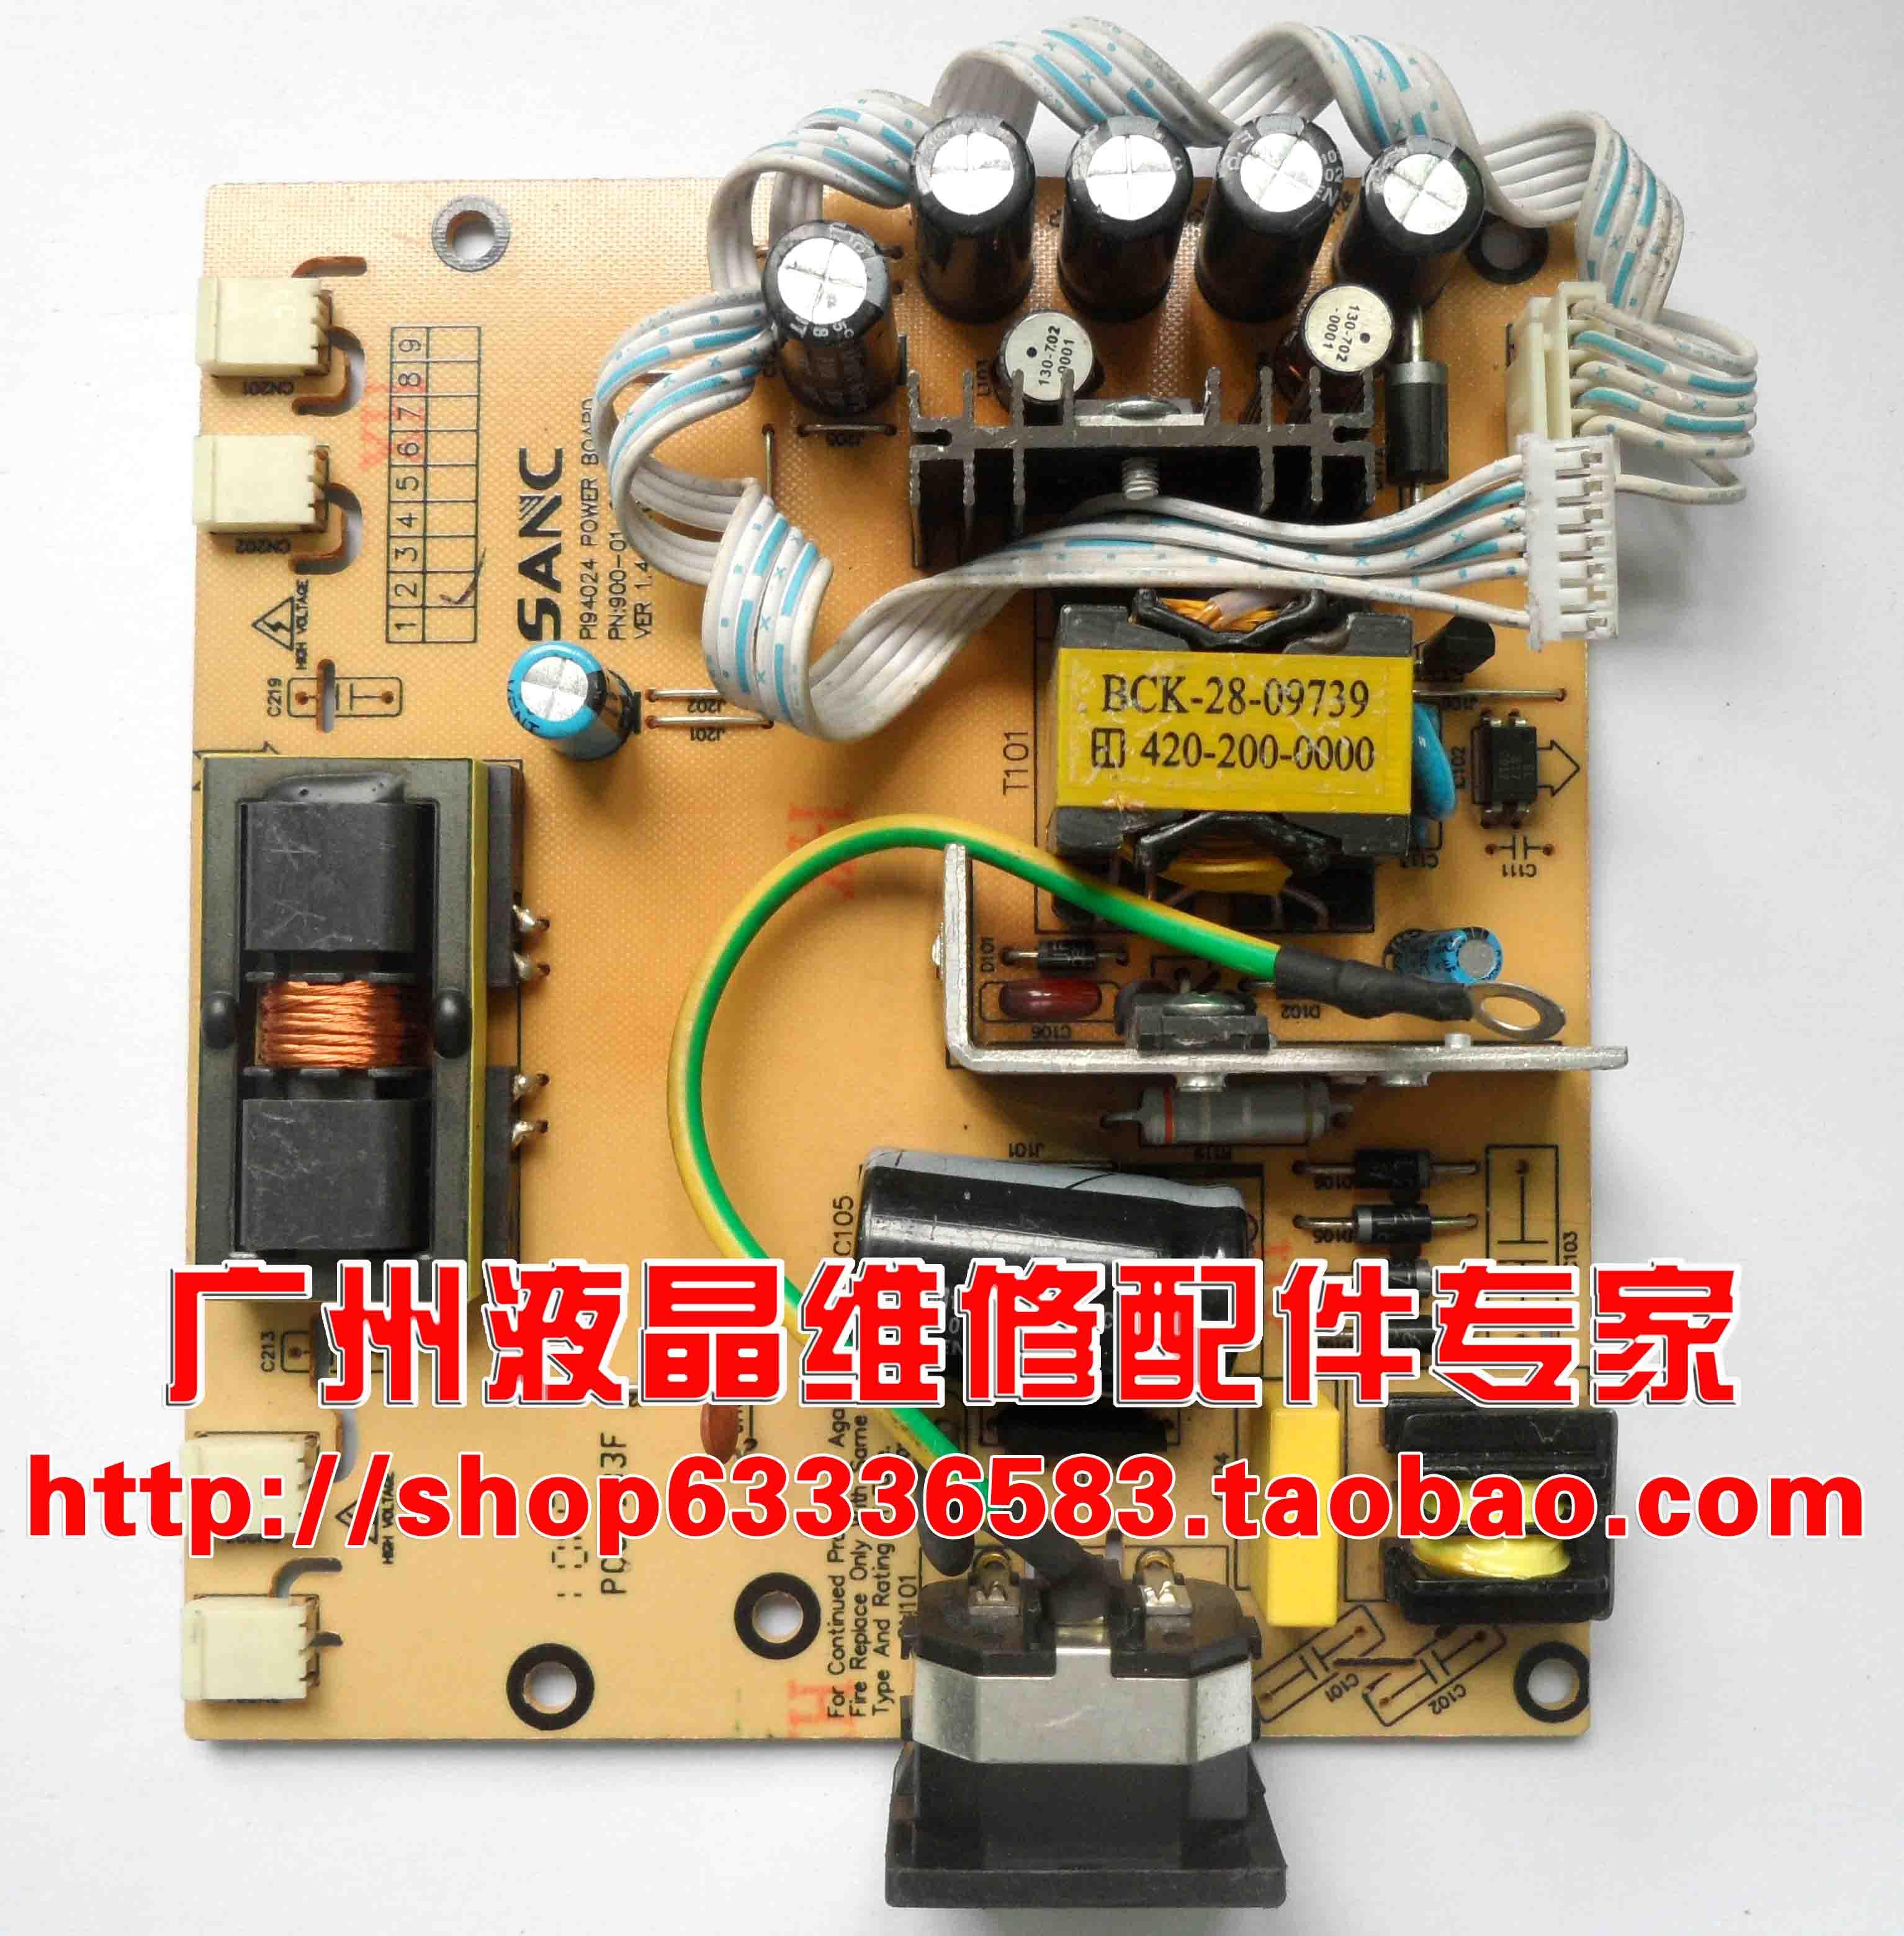 Free Shipping>Original 100% Tested Work 97CM GOVO 96BM 97EM PC61183F direct generation PI94024 power board